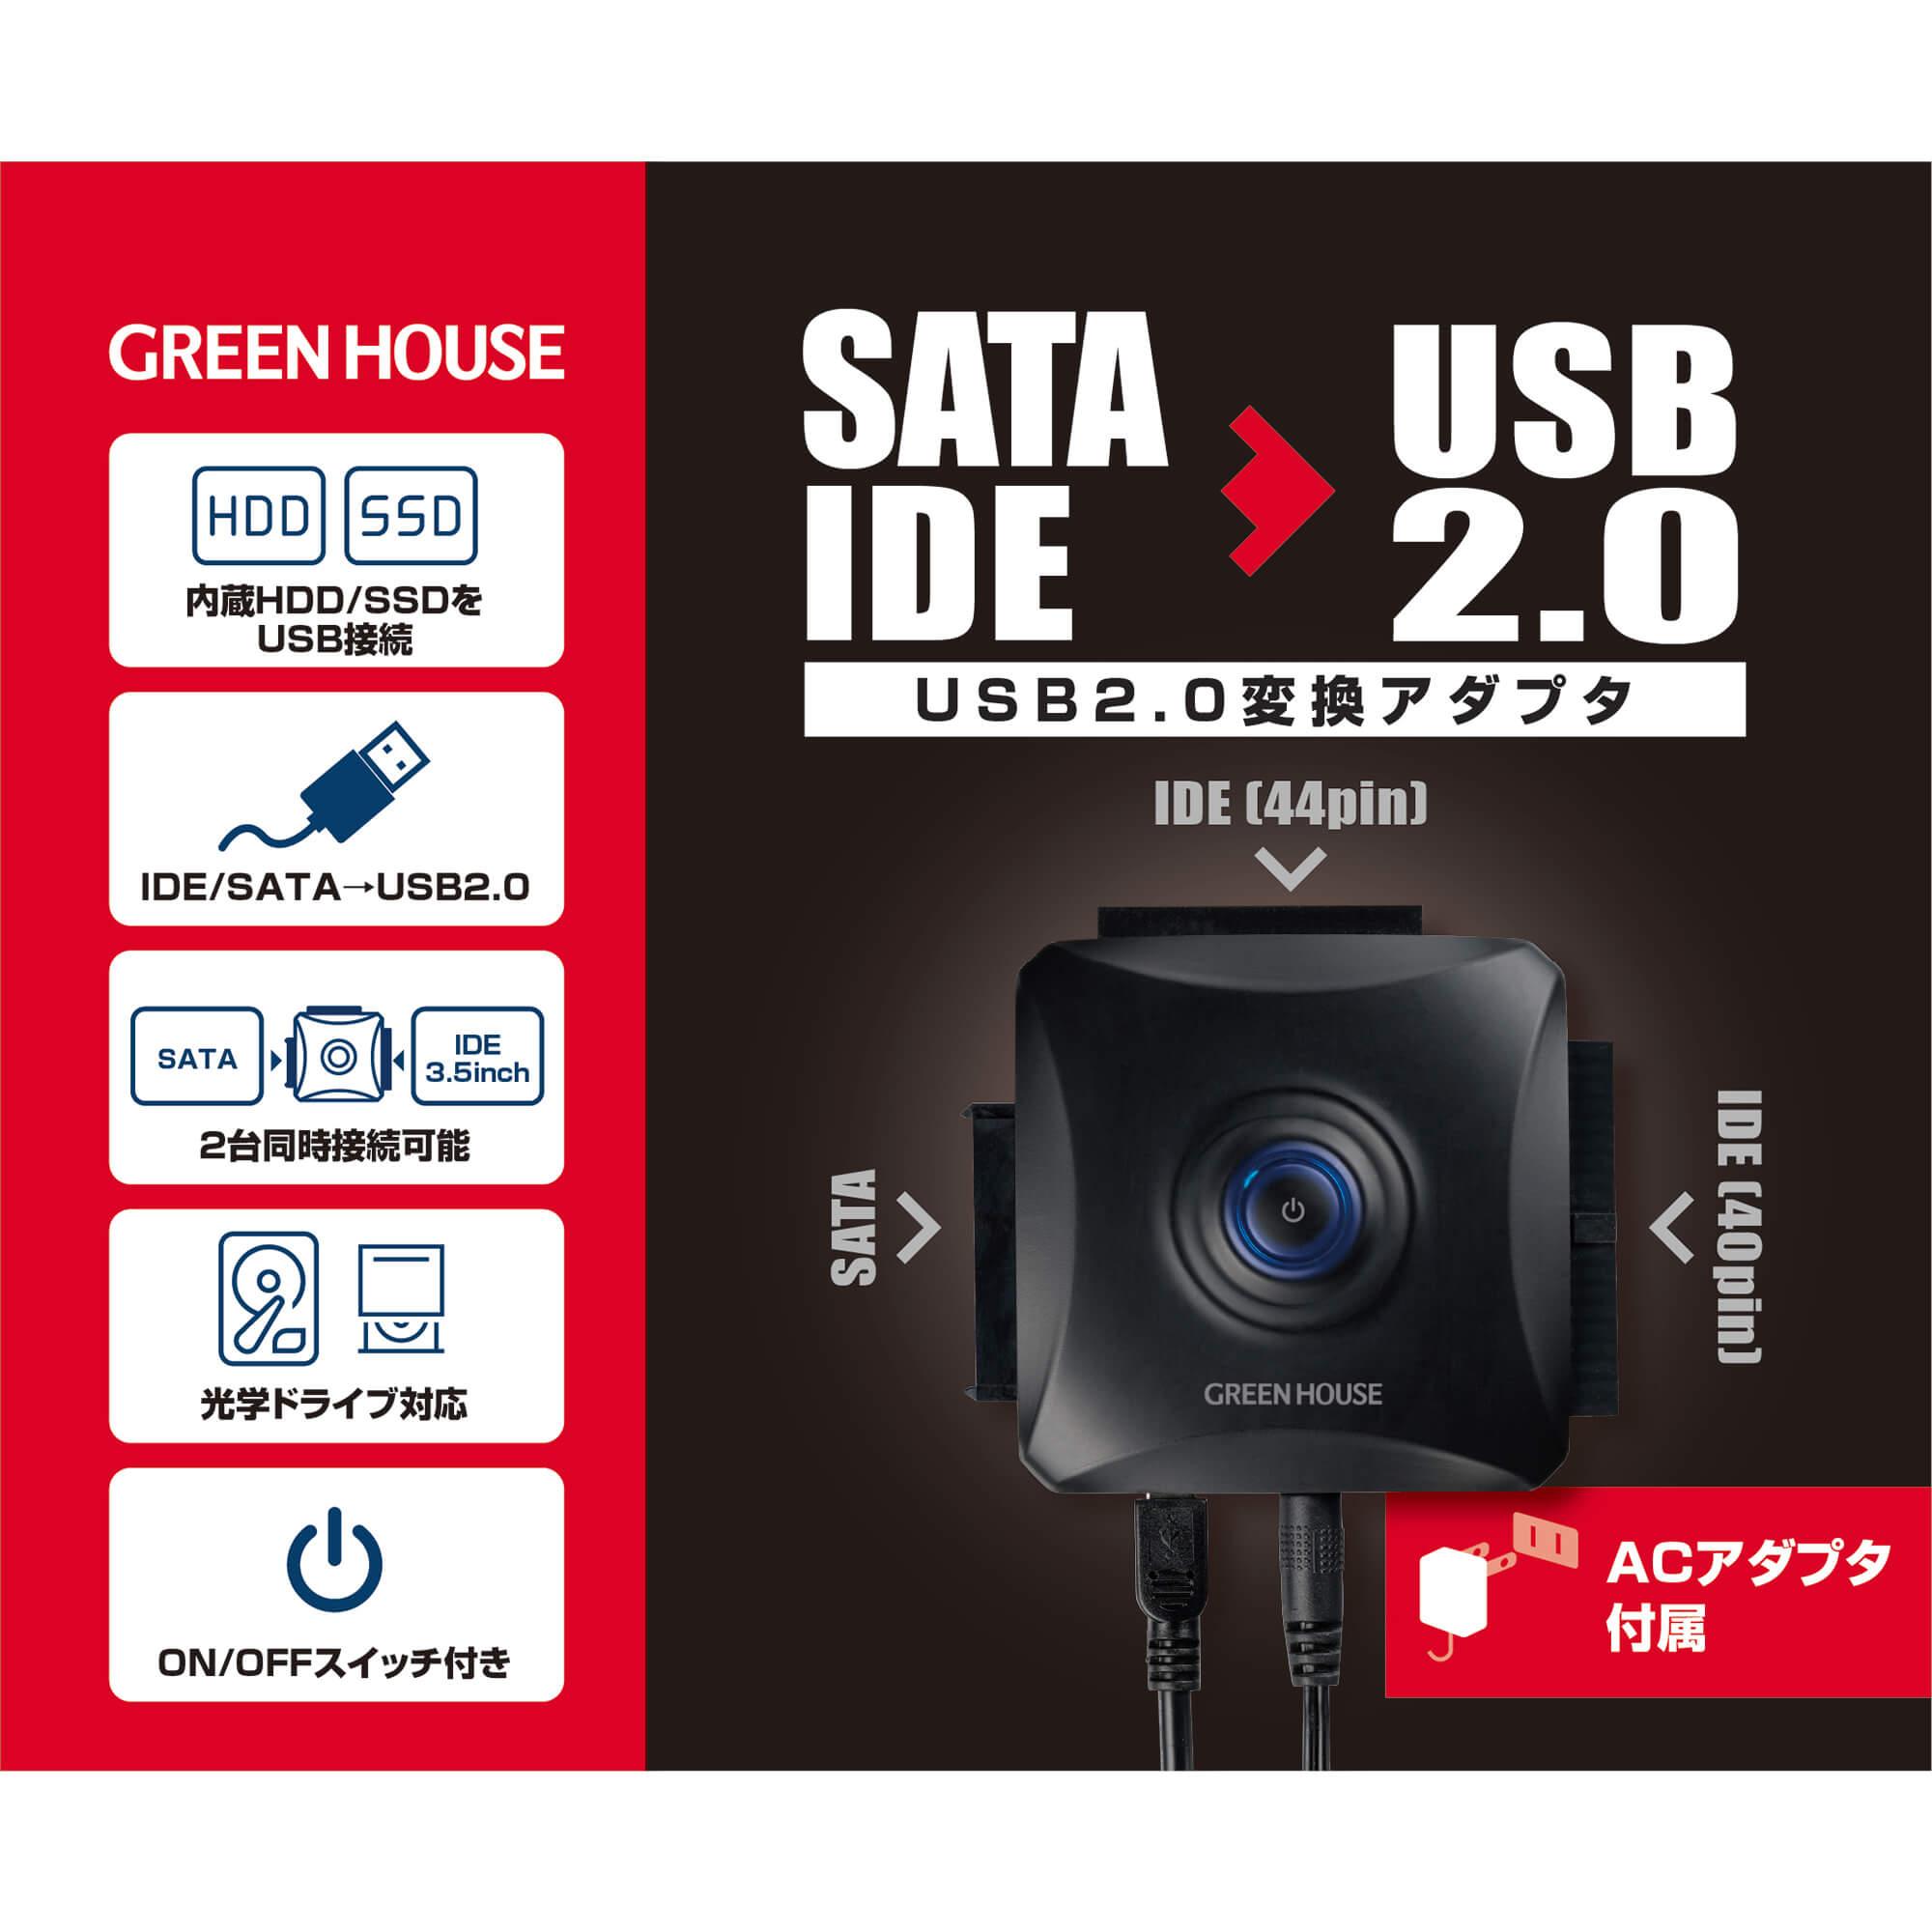 GH-USHD-IDESB